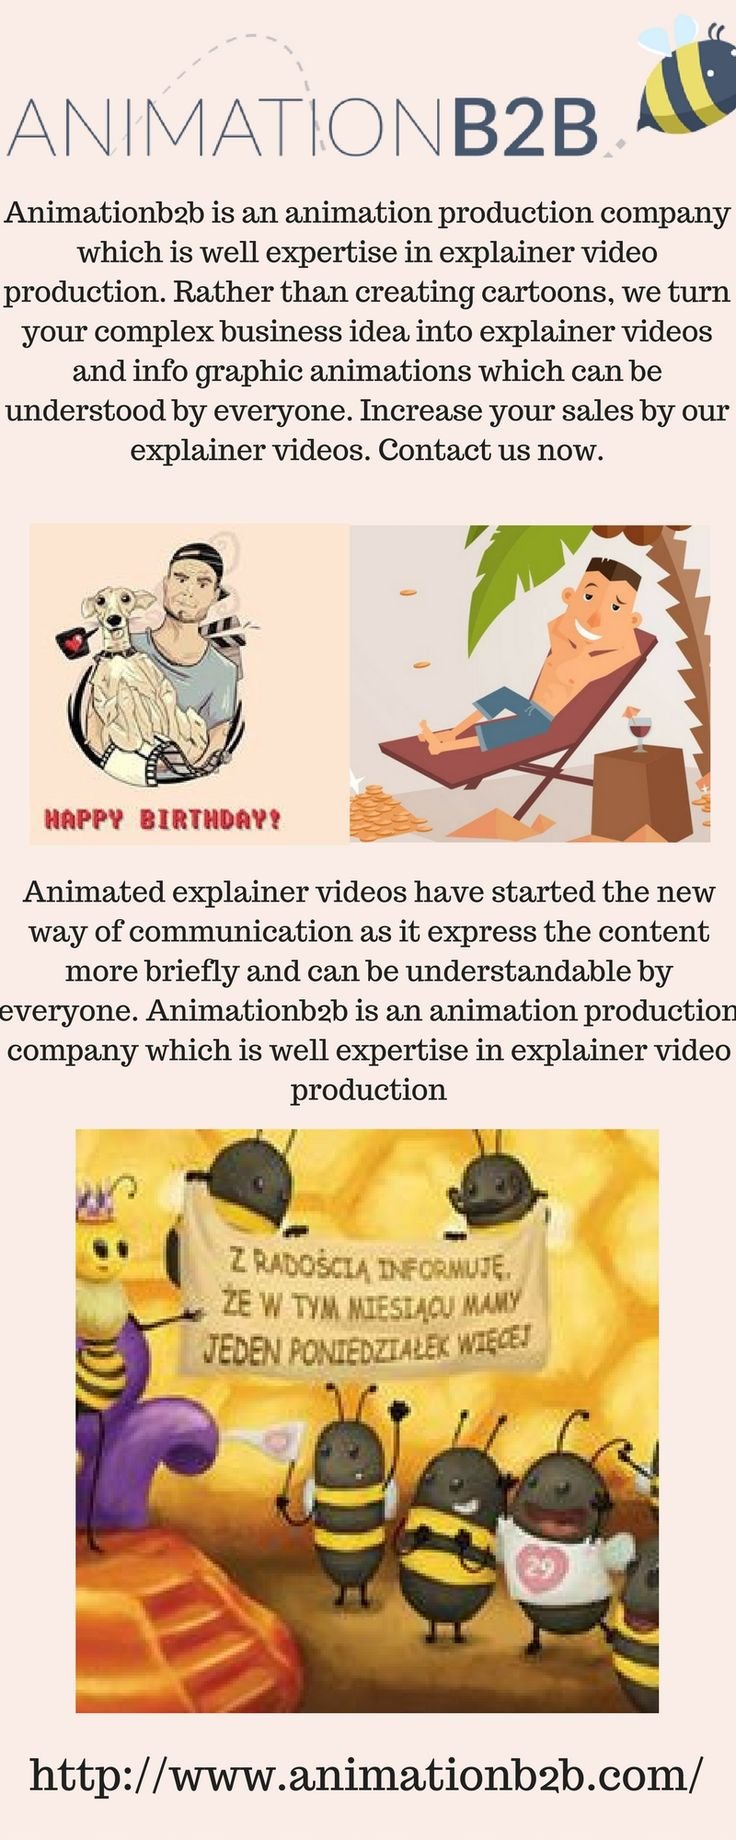 #Animationb2b - An Animation Production Company See more at :- goo.gl/8B7rHn